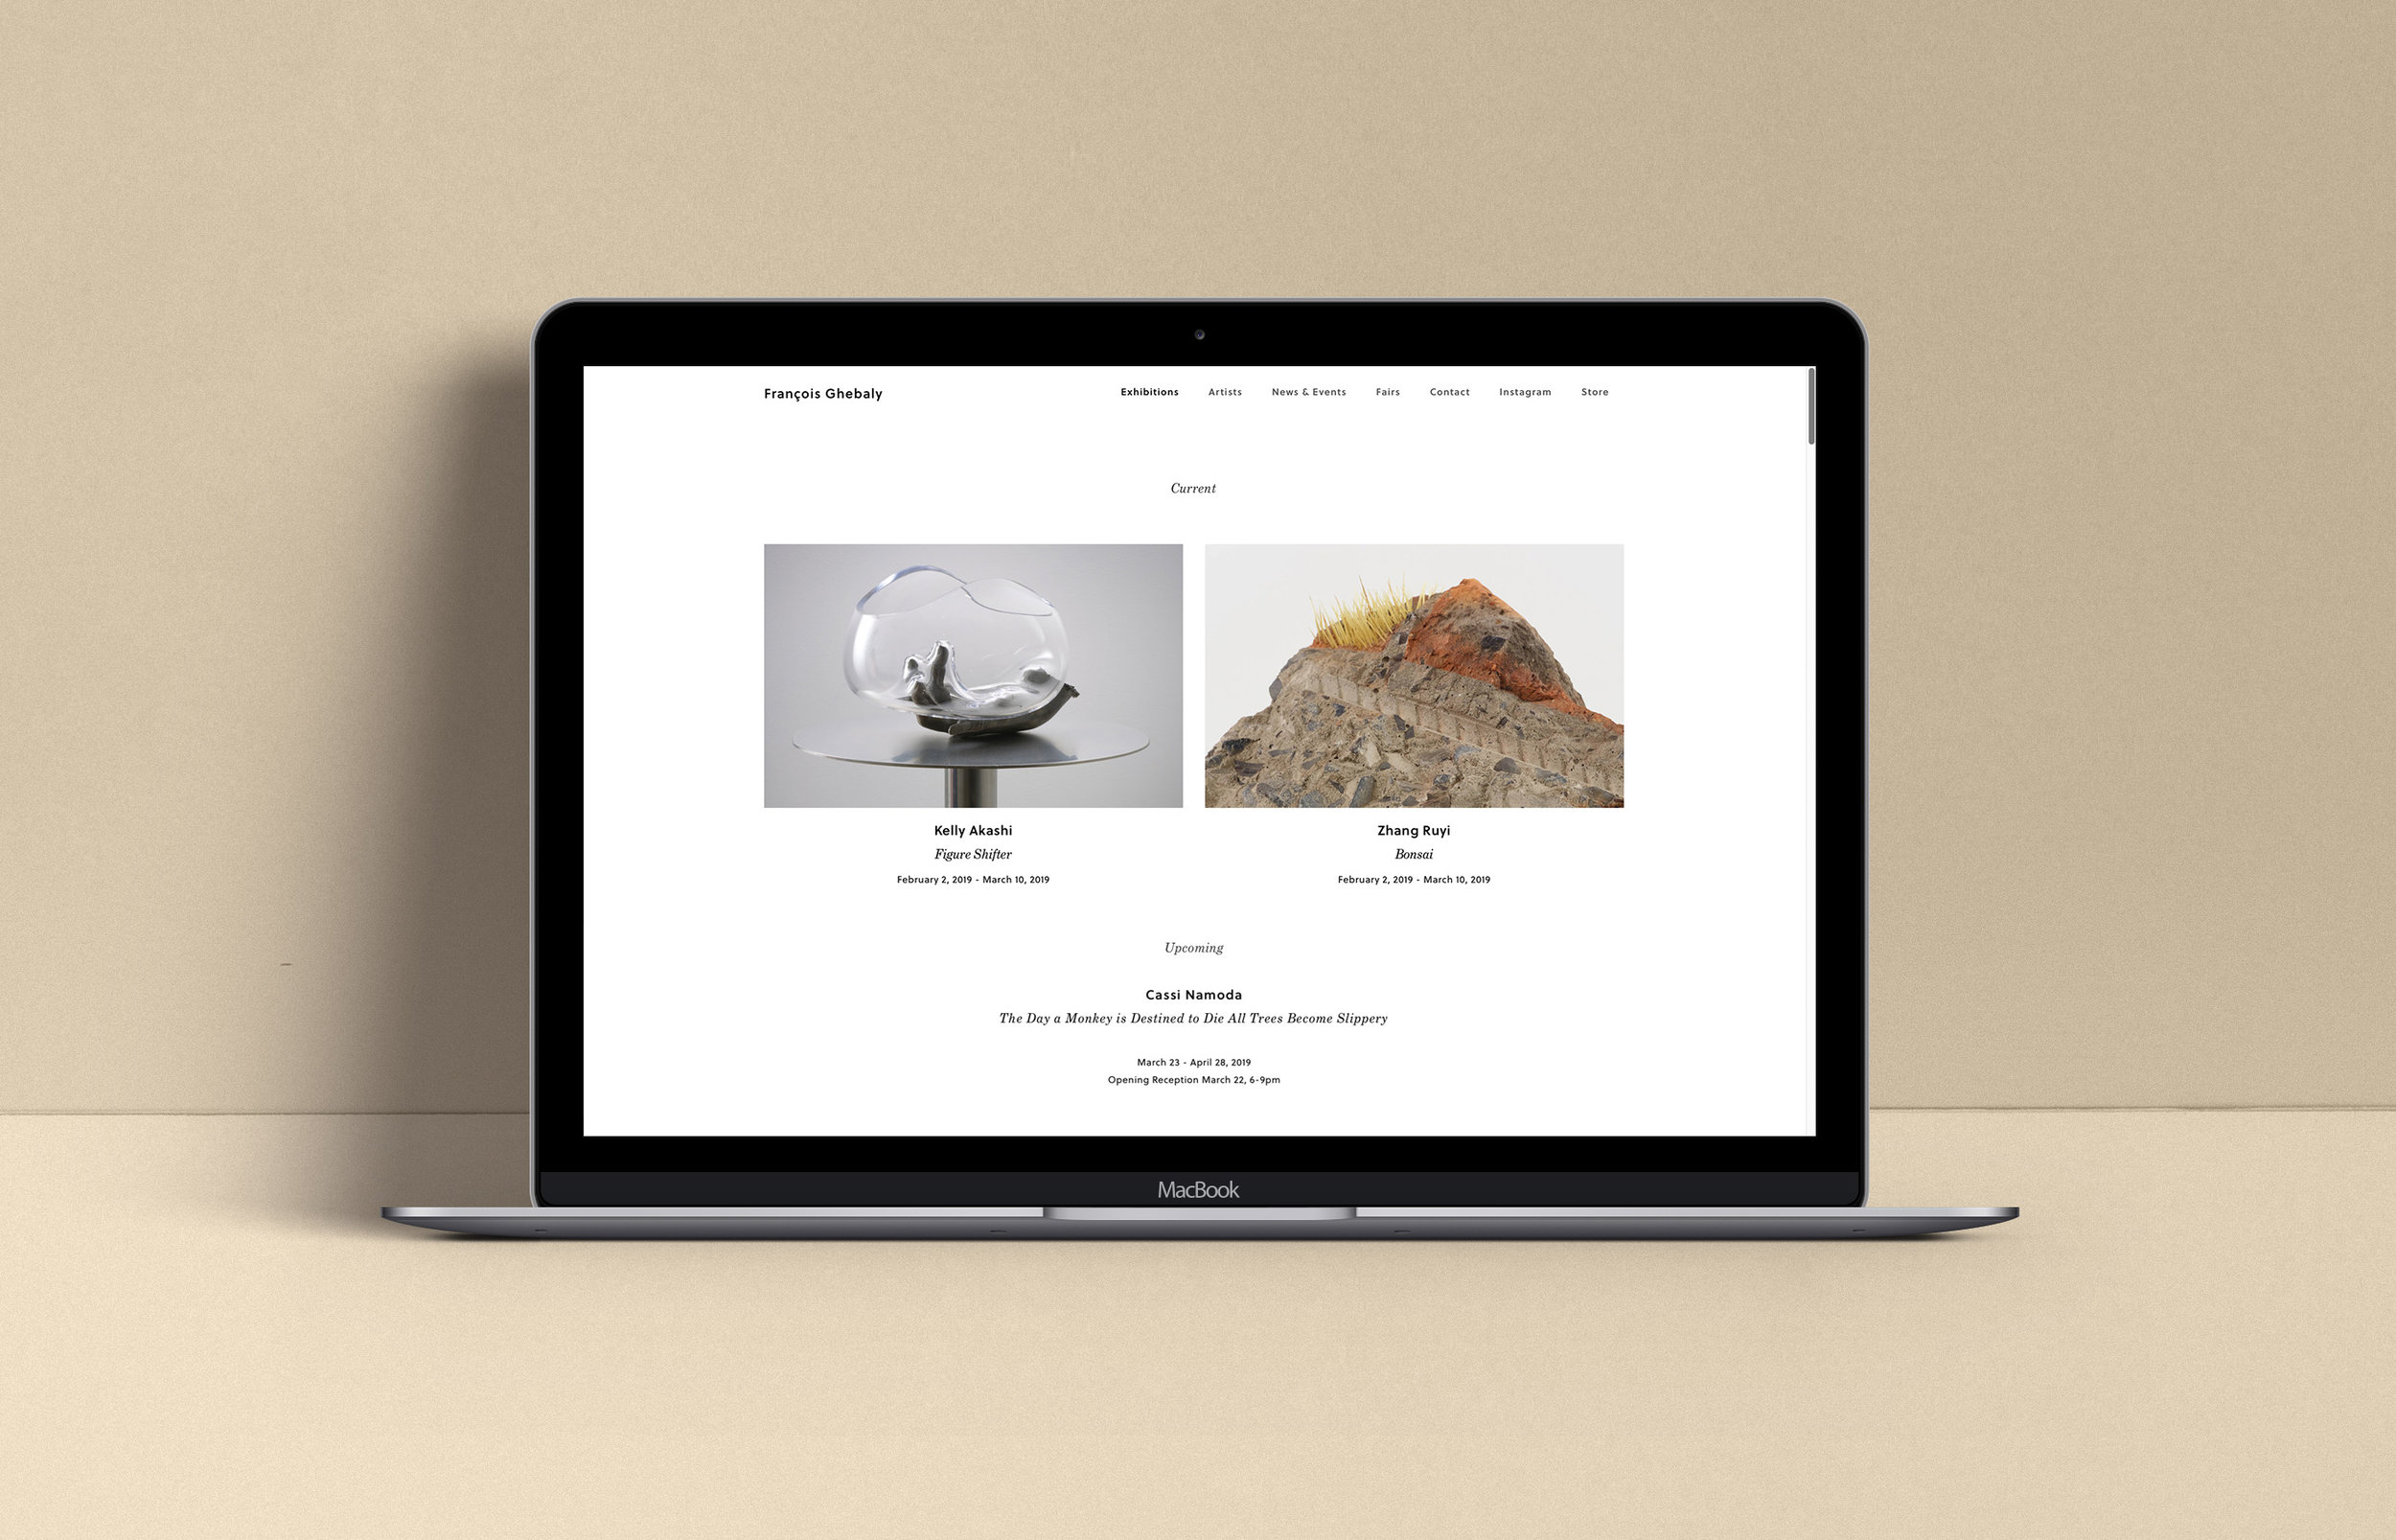 Francois-Ghebaly-Website-on-laptop-R2.jpg